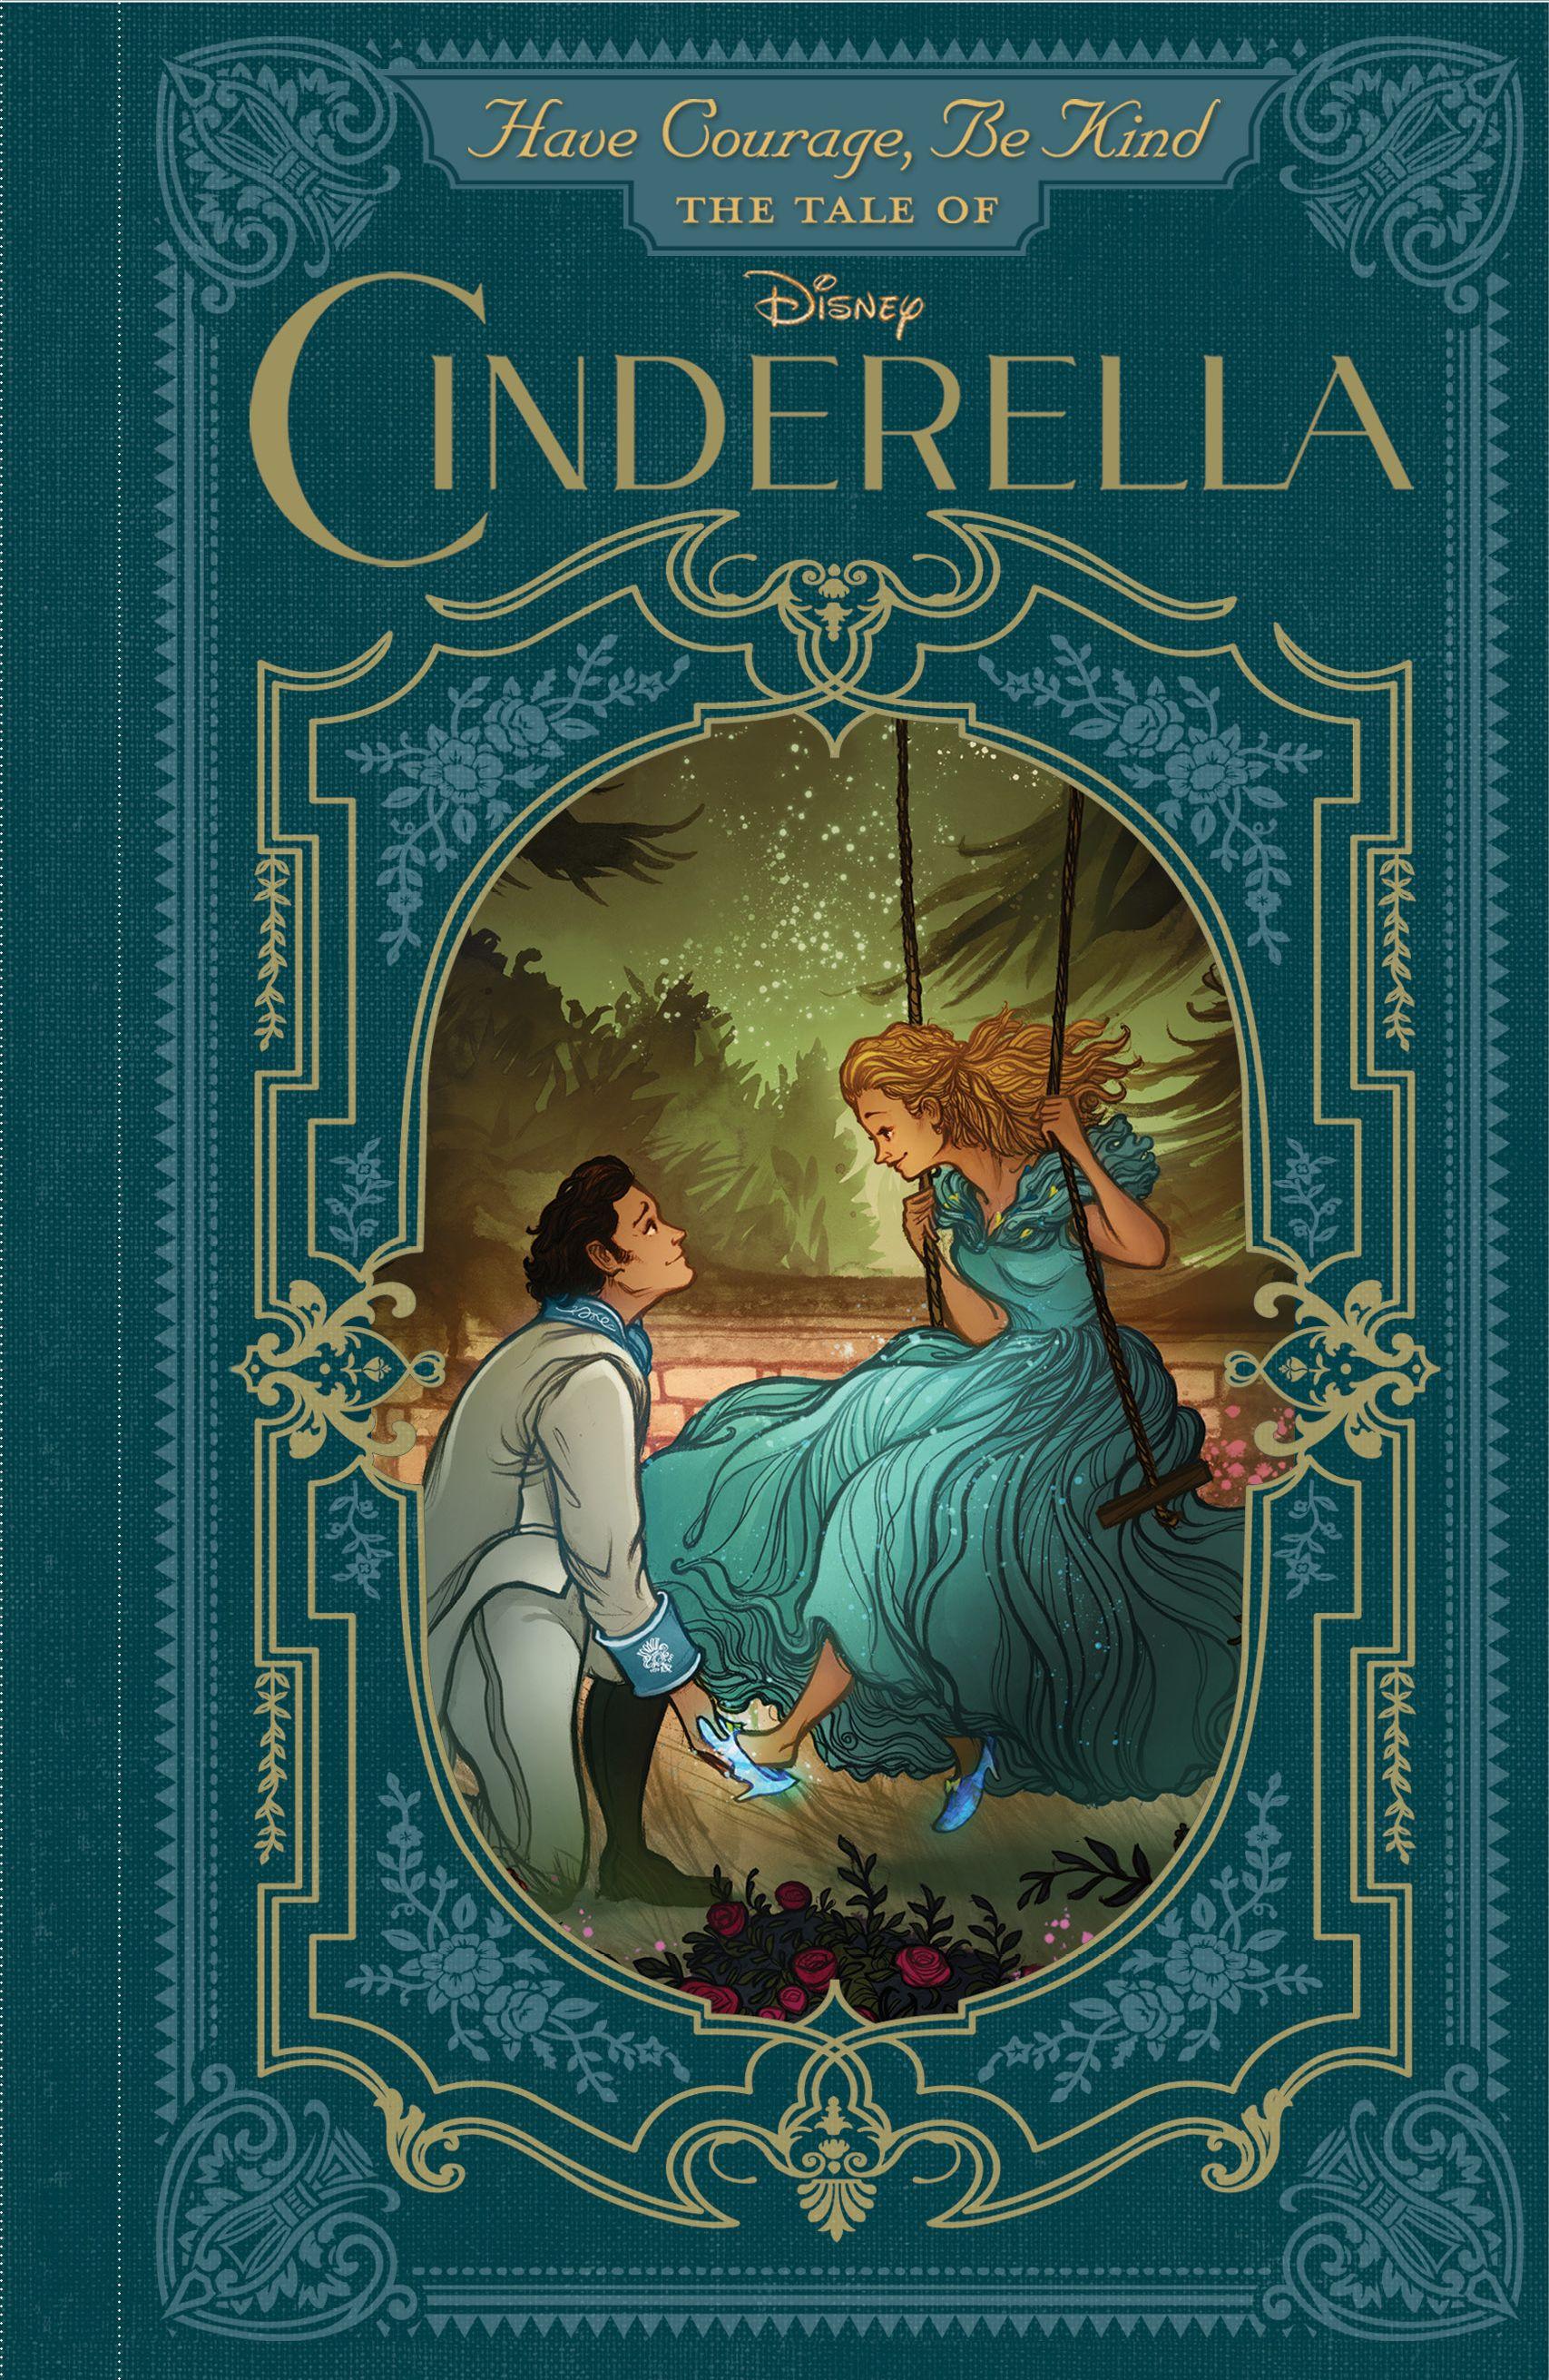 cinderella picture books - Google Search | Cinderella Stories ...